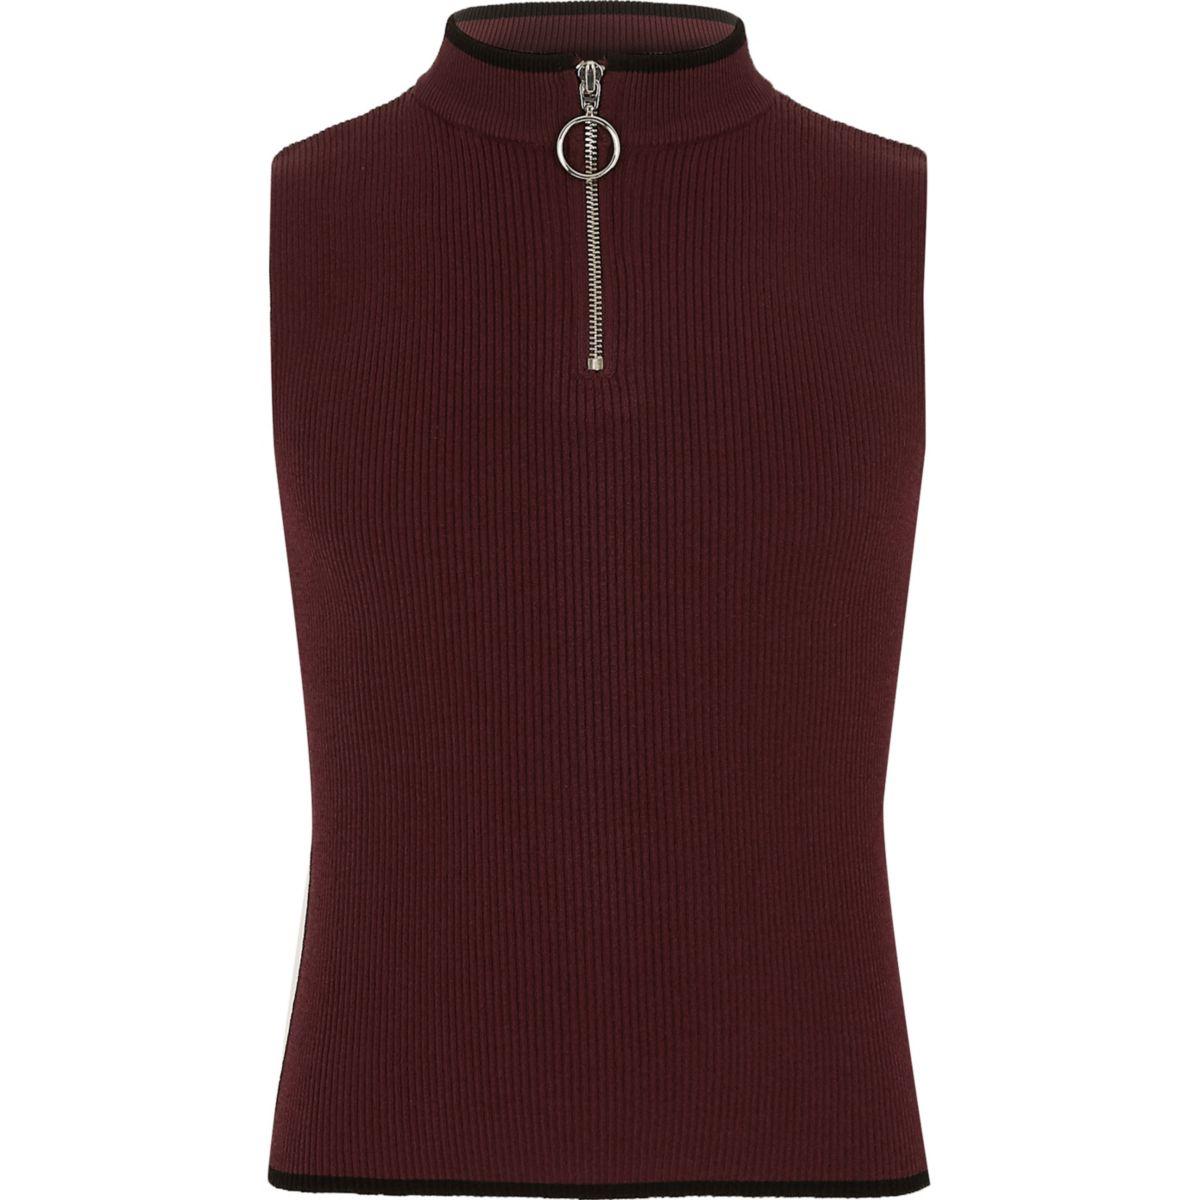 Girls dark red rib knit zip neck tank top